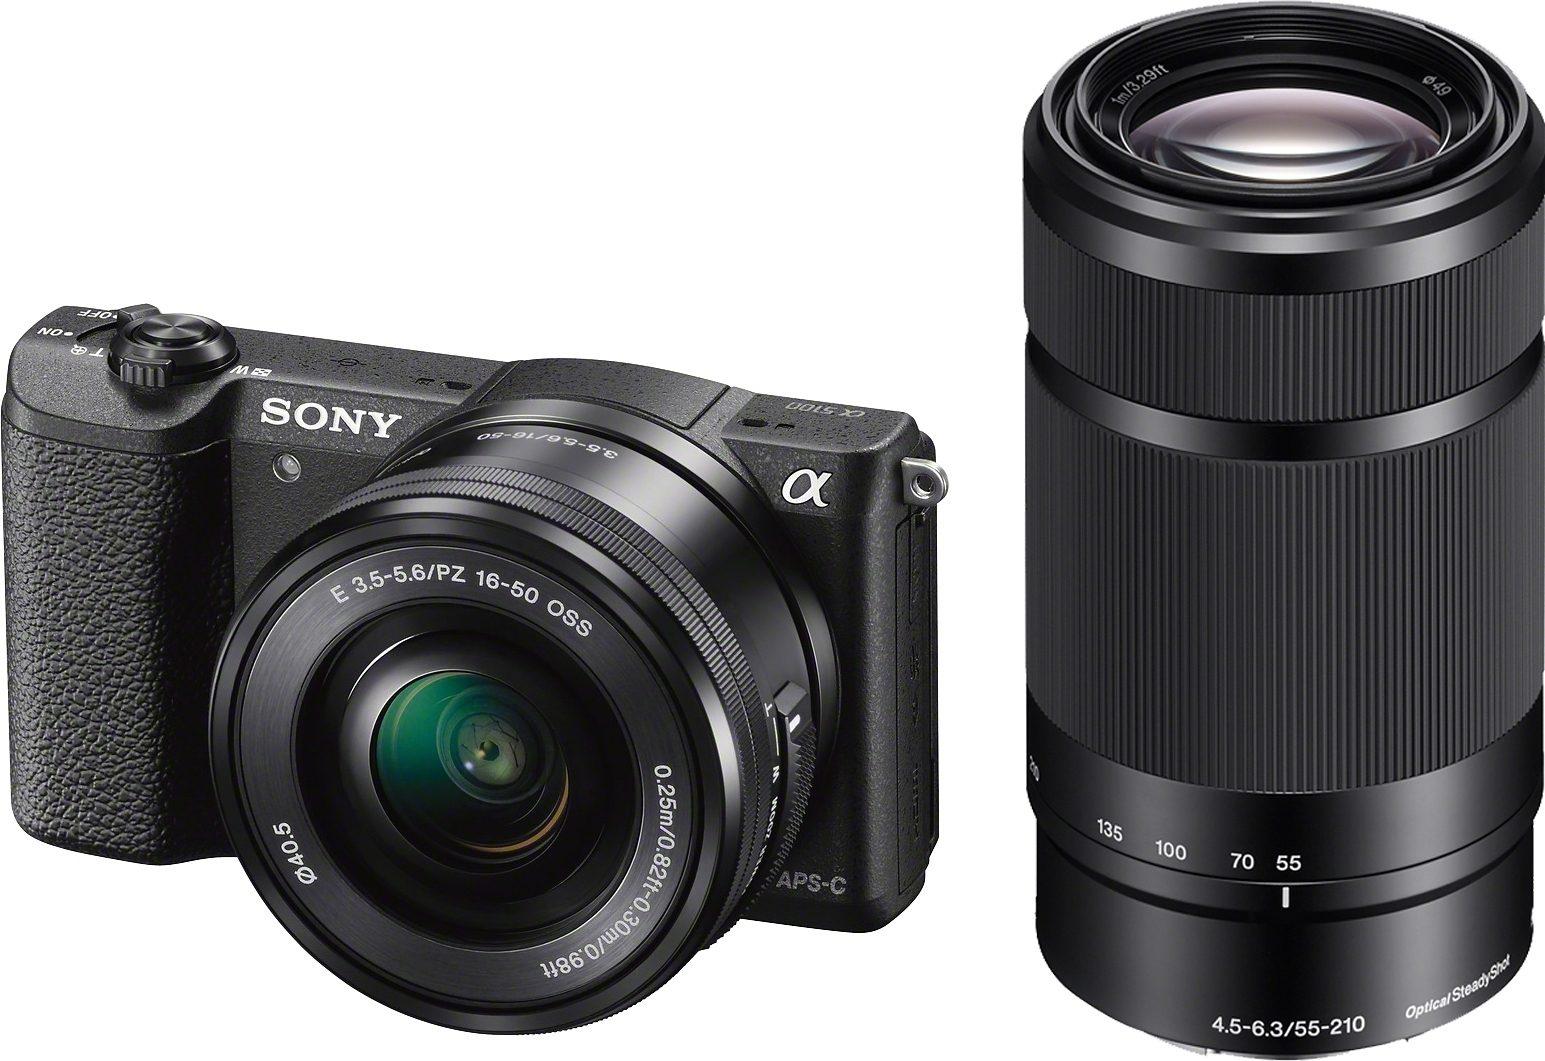 Sony Alpha ILCE-5100Y Set System Kamera, inkl. 2 SEL Objektive (16-50mm & 55-210mm), 24,3 Megapixel